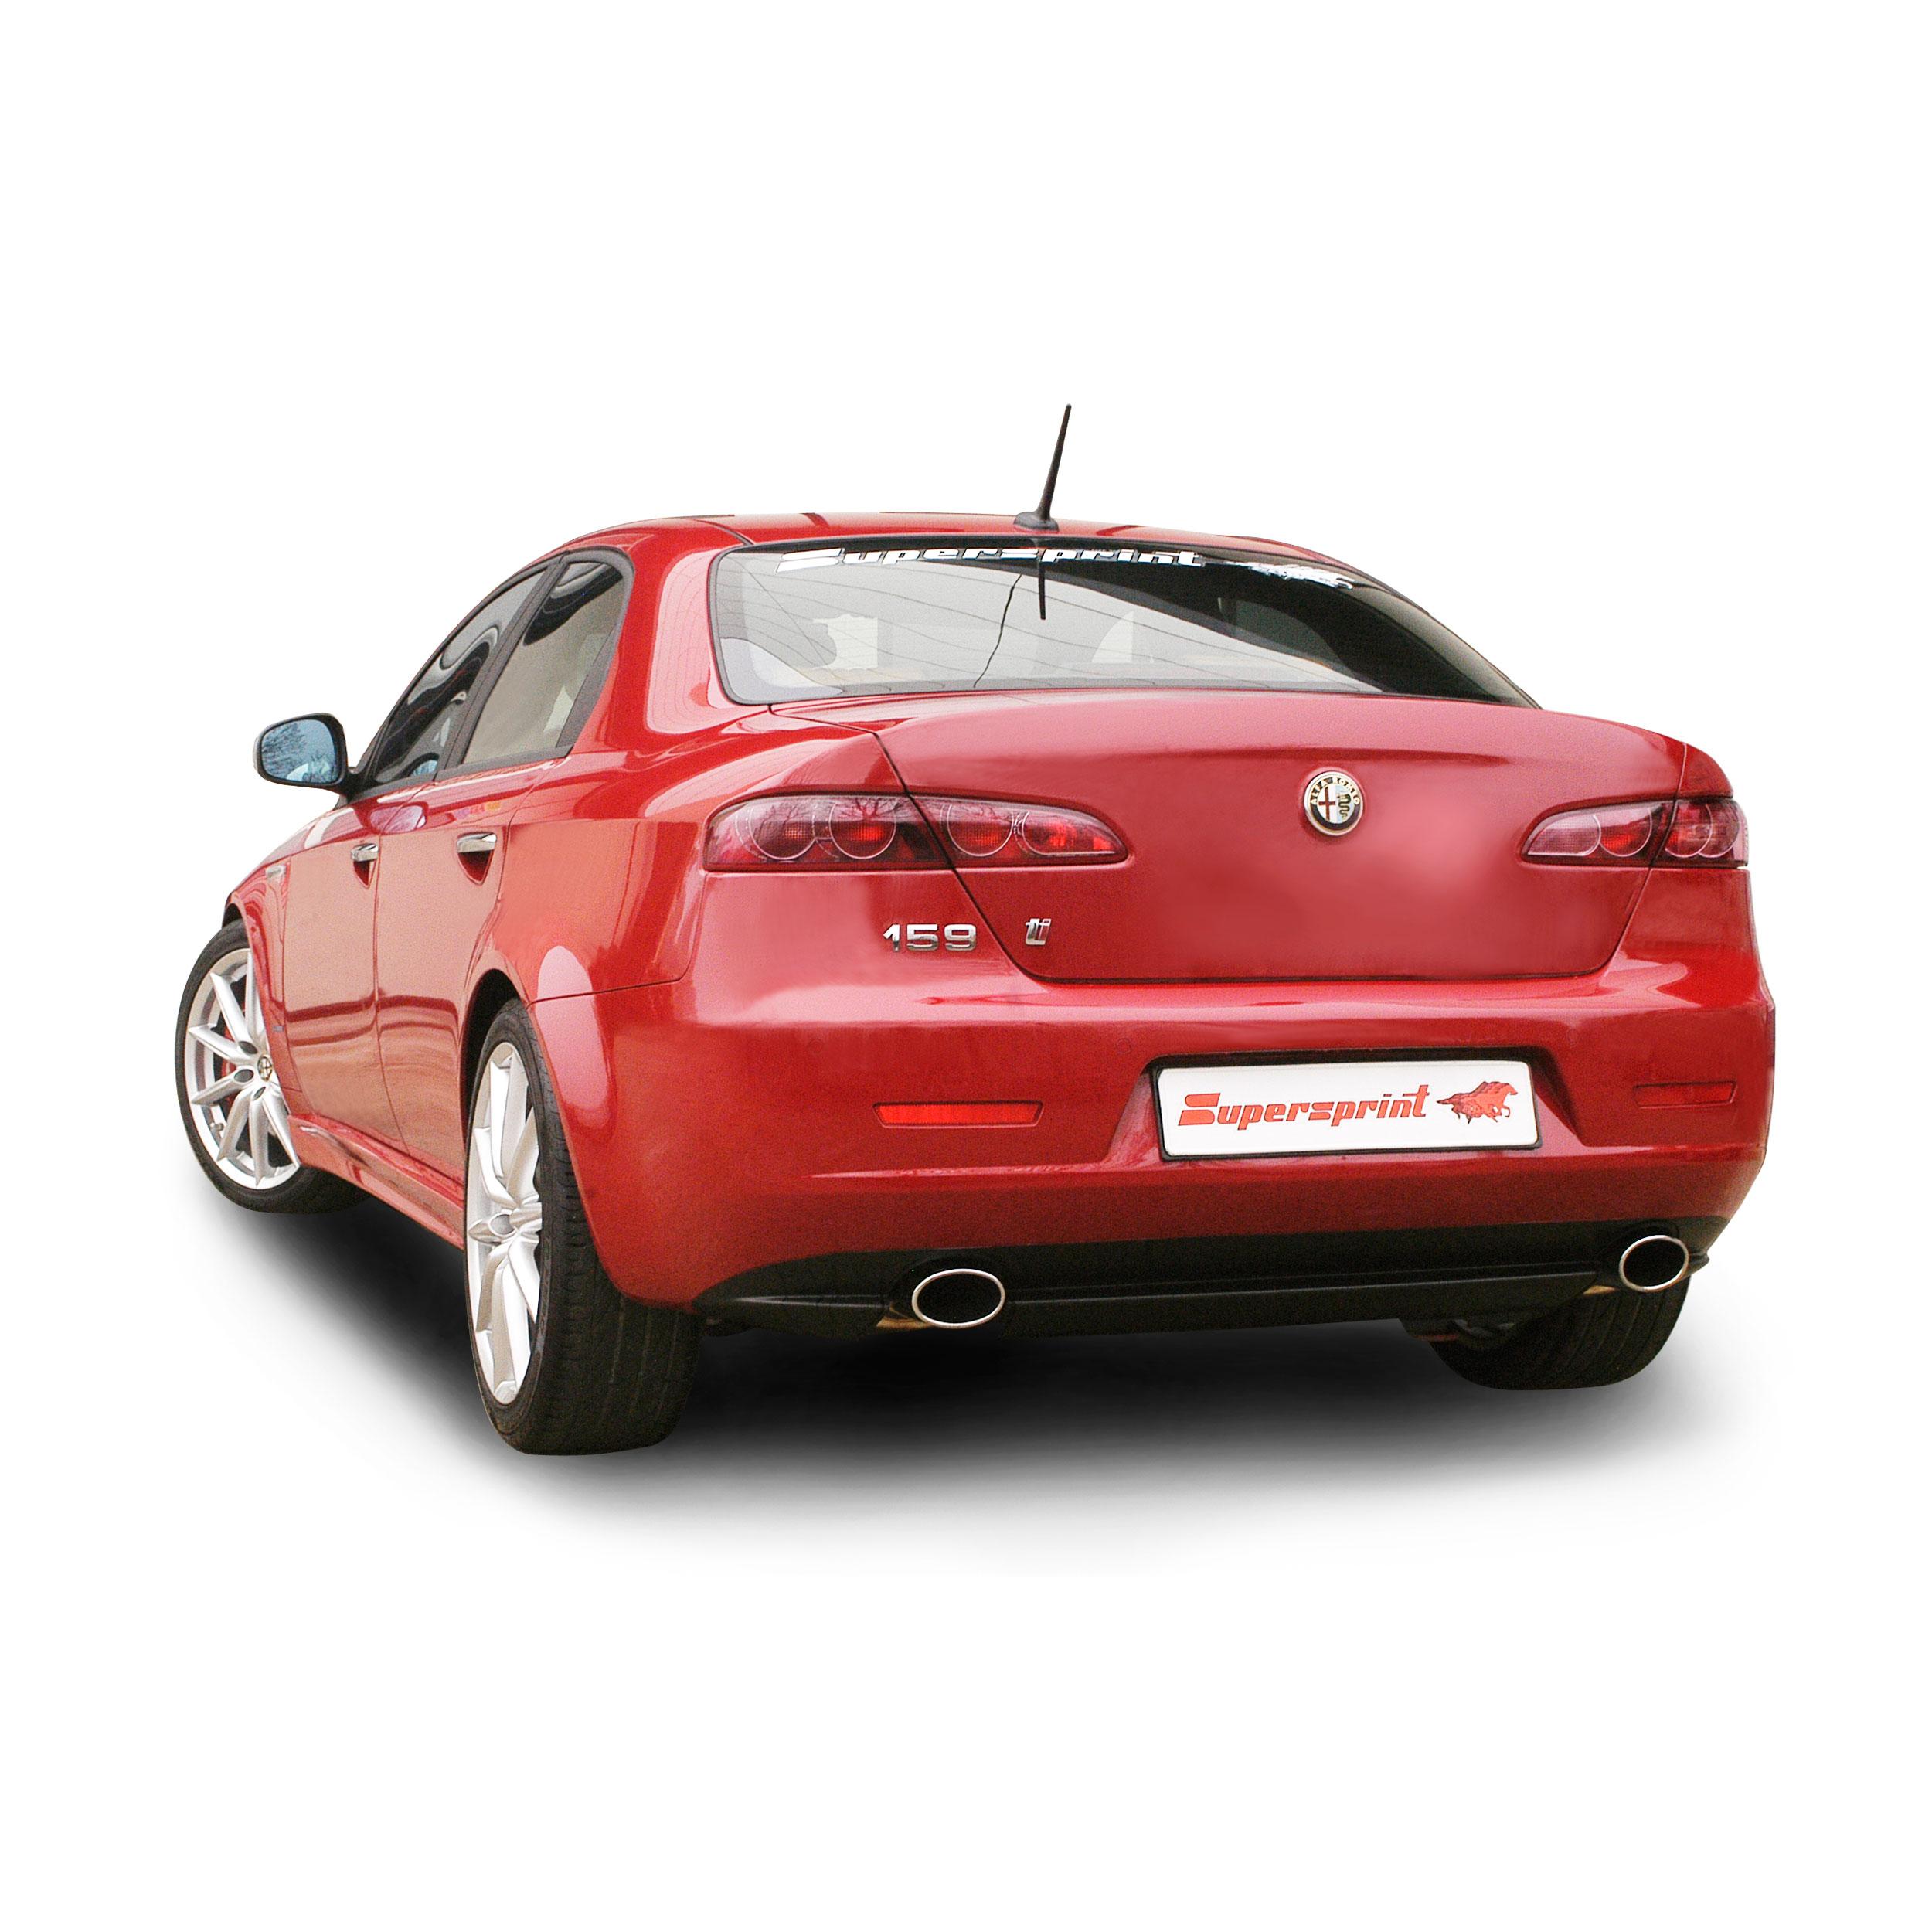 ALFA ROMEO 159 1750 TBi (200 Hp) 2009 -> 2011, Alfa Romeo